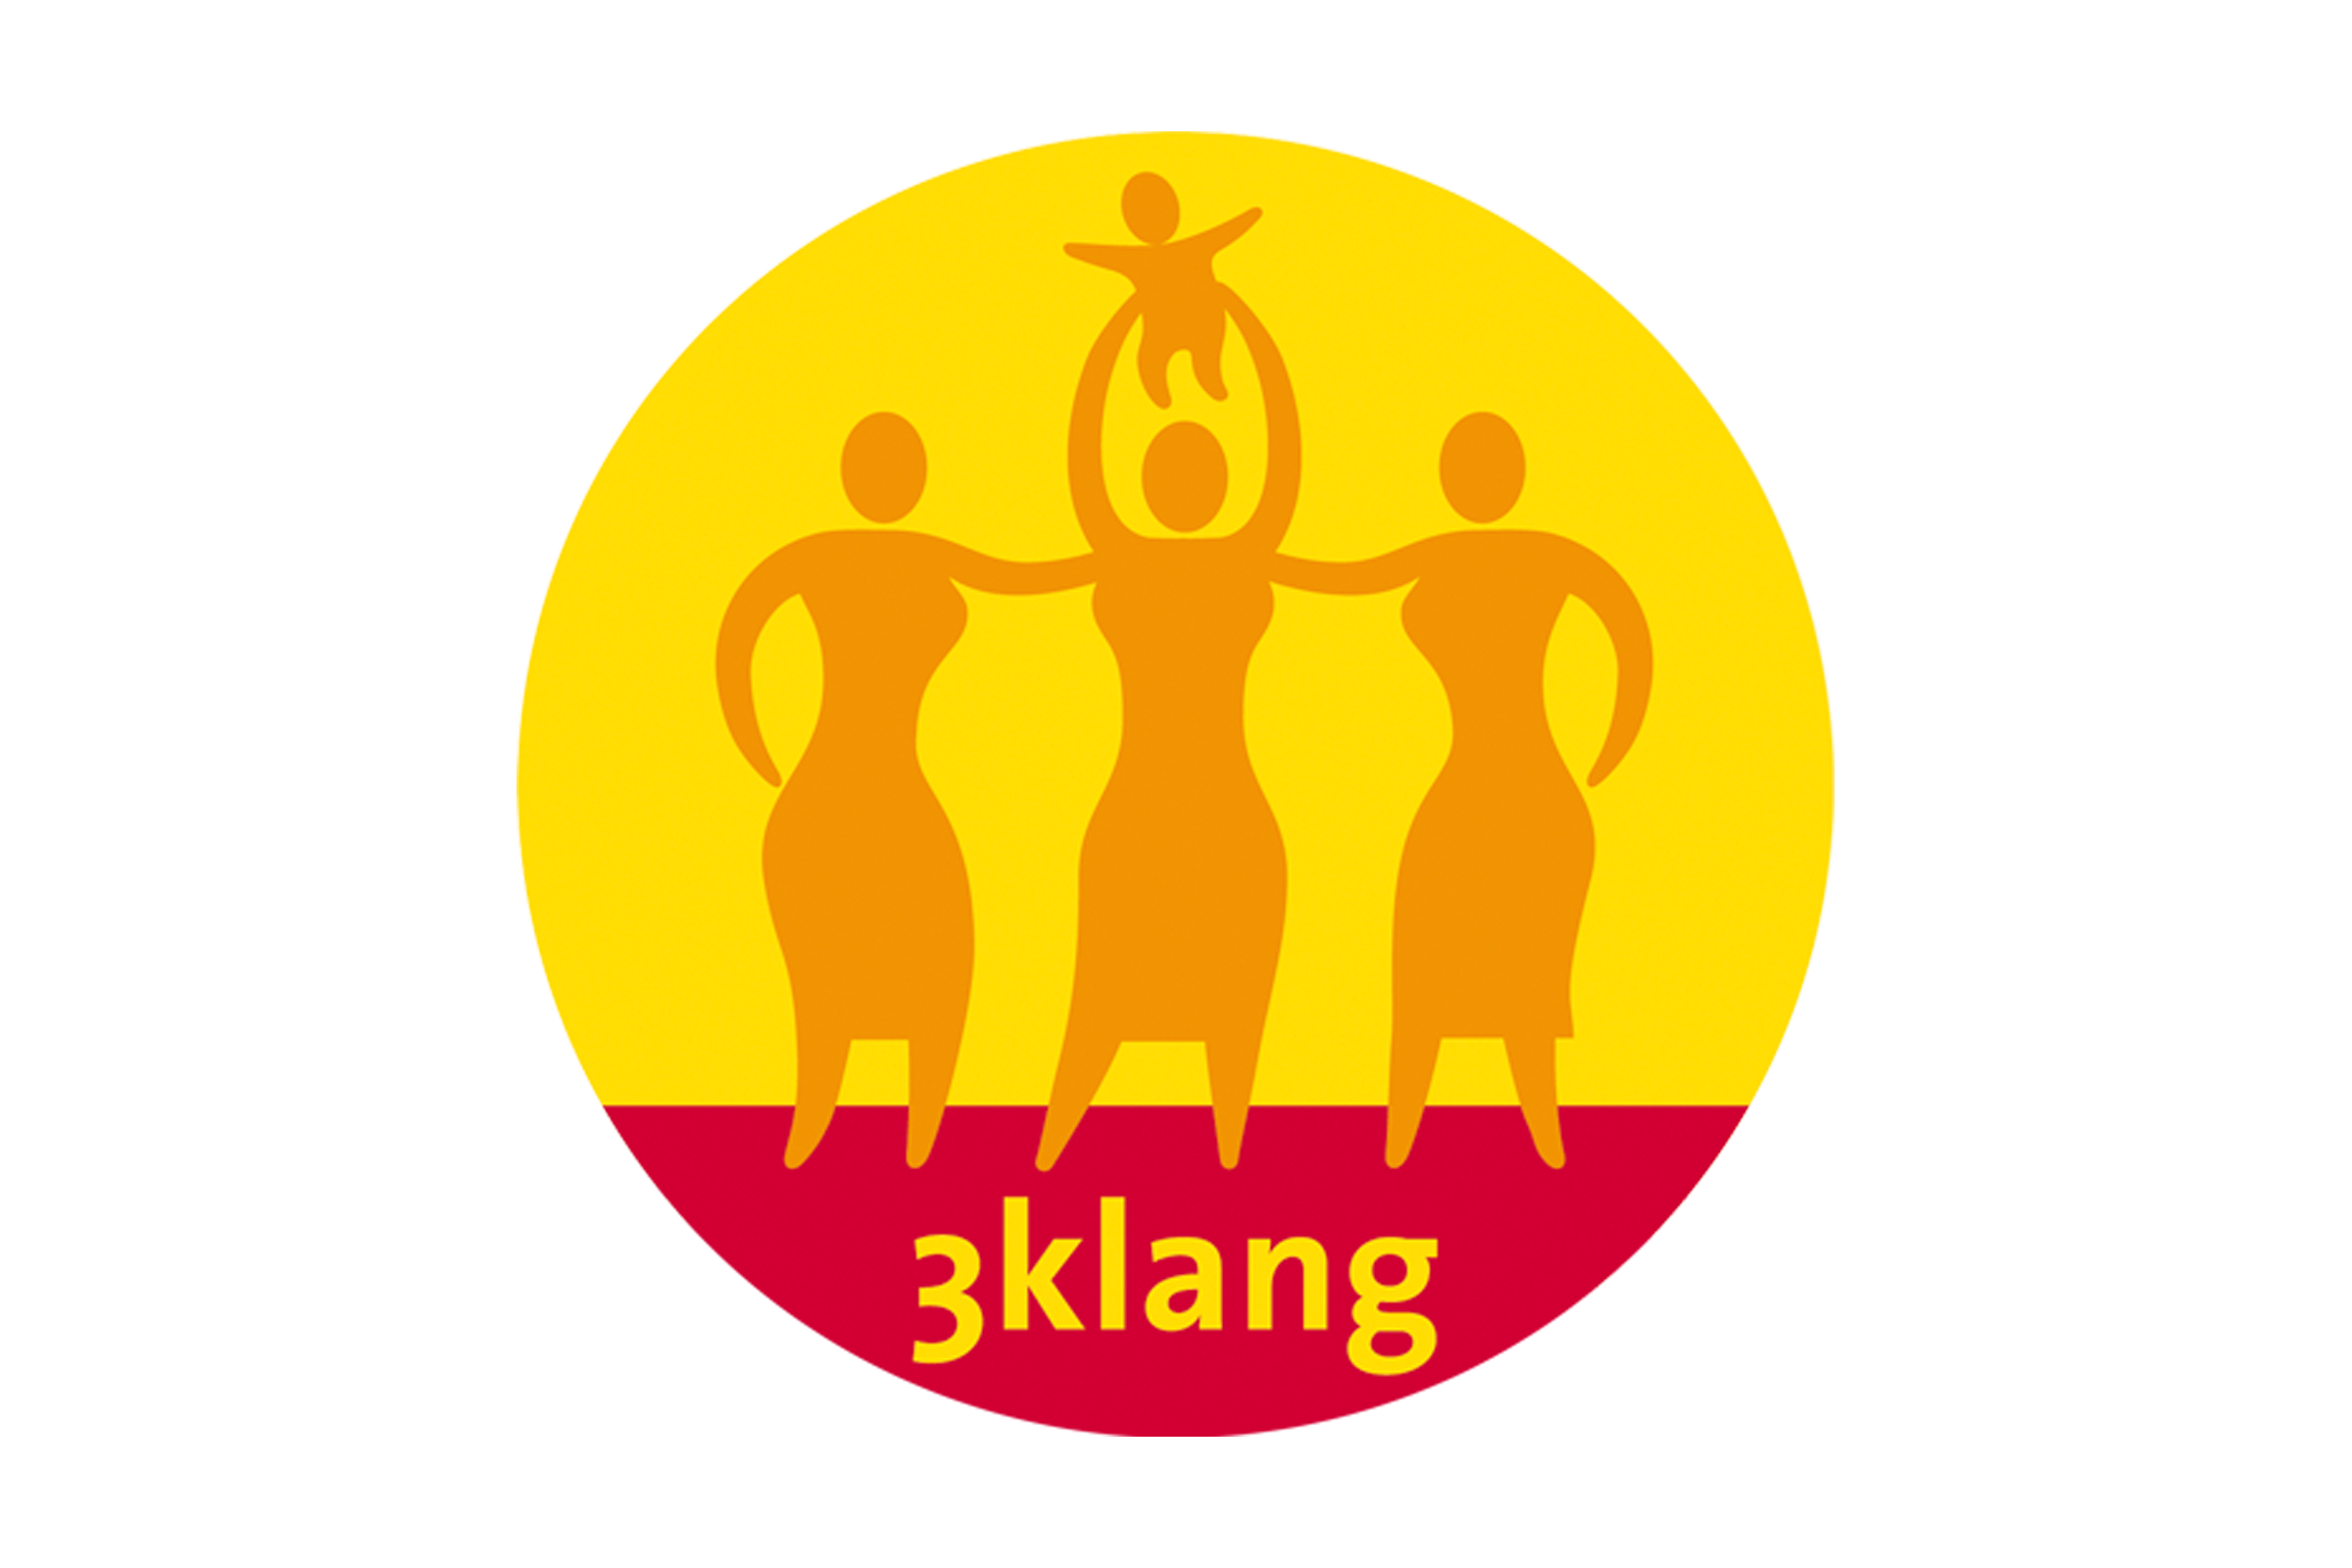 Logo 3klang bisher